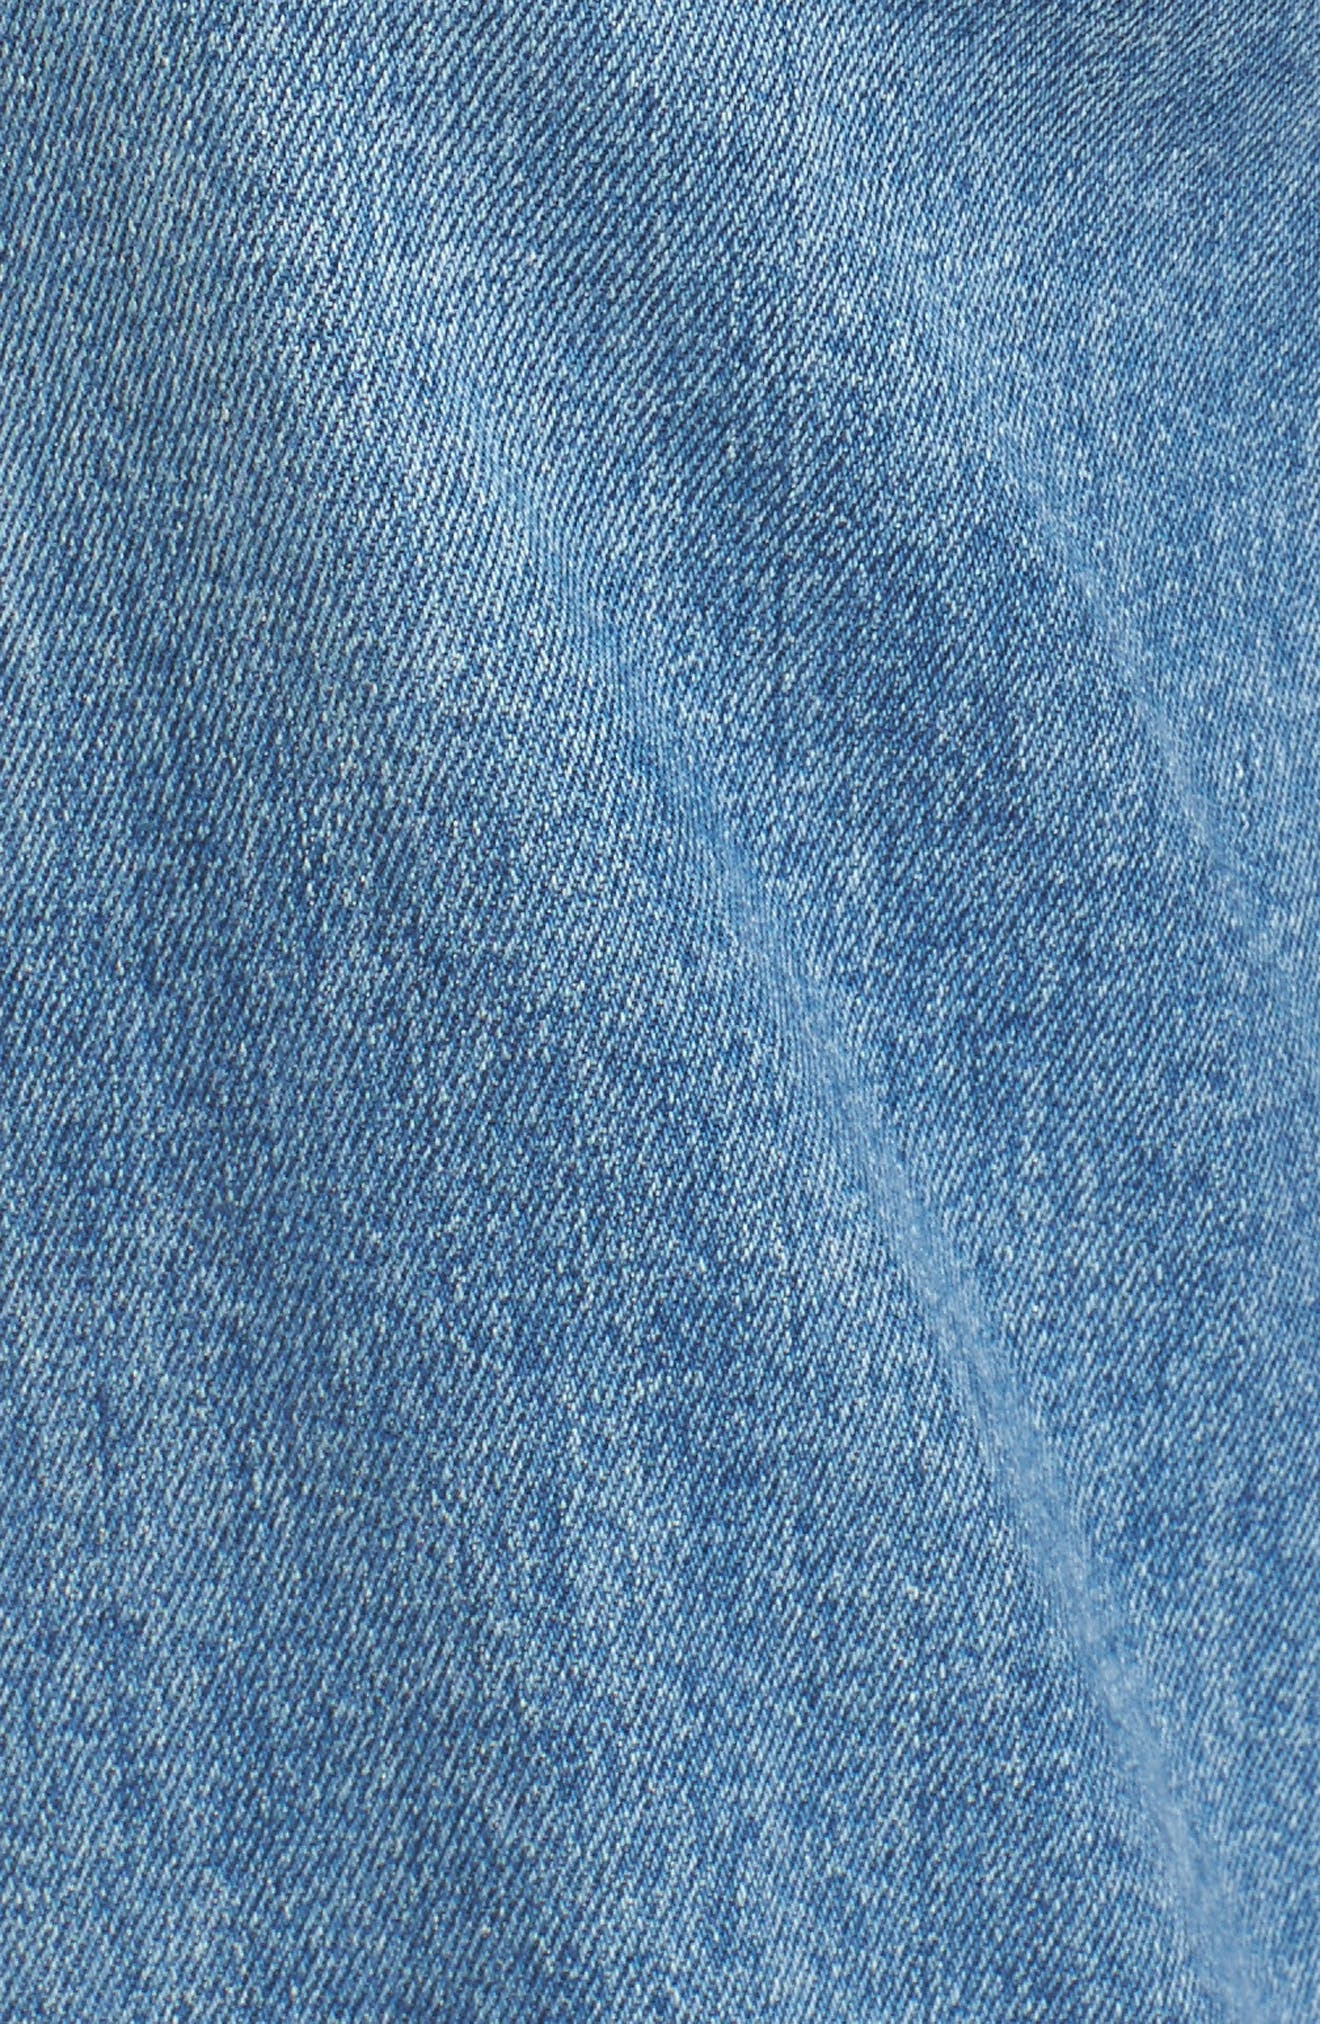 Vintage - Sarah High Waist Crop Straight Leg Jeans,                             Alternate thumbnail 6, color,                             400